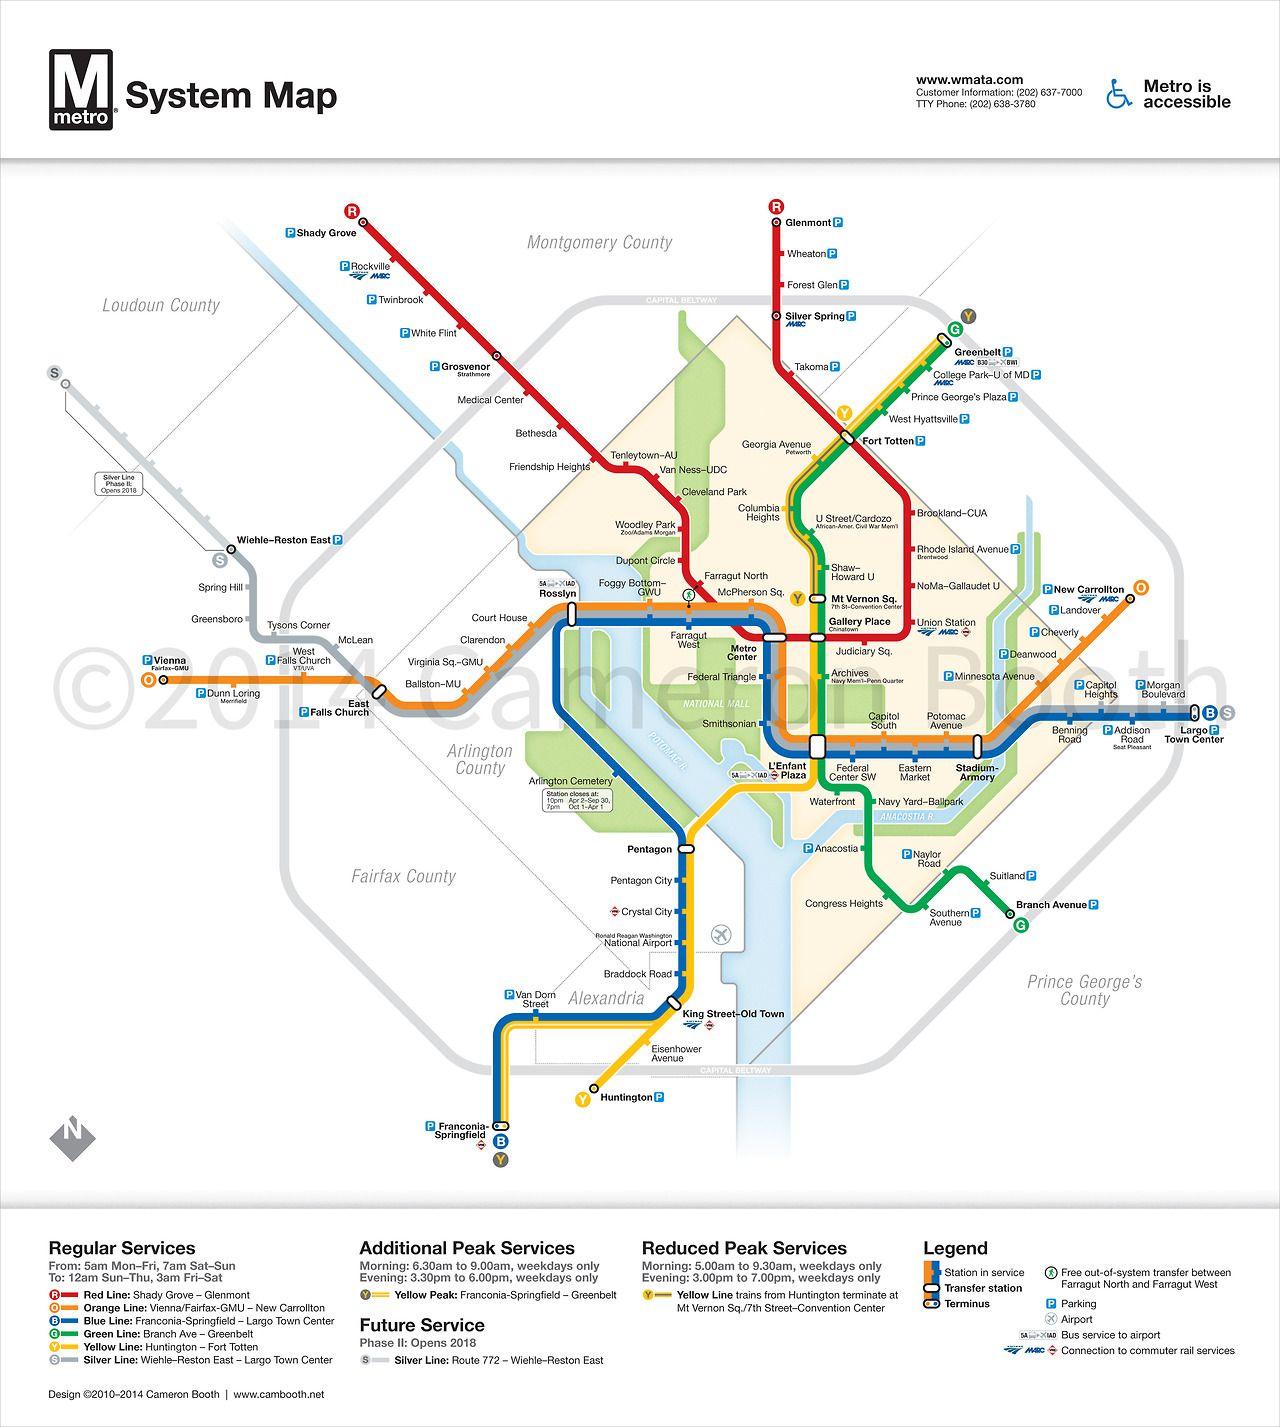 Washington Dc Subway Map Silver Line.Unofficial Map Washington Dc Metro Map With Silver Line 2014